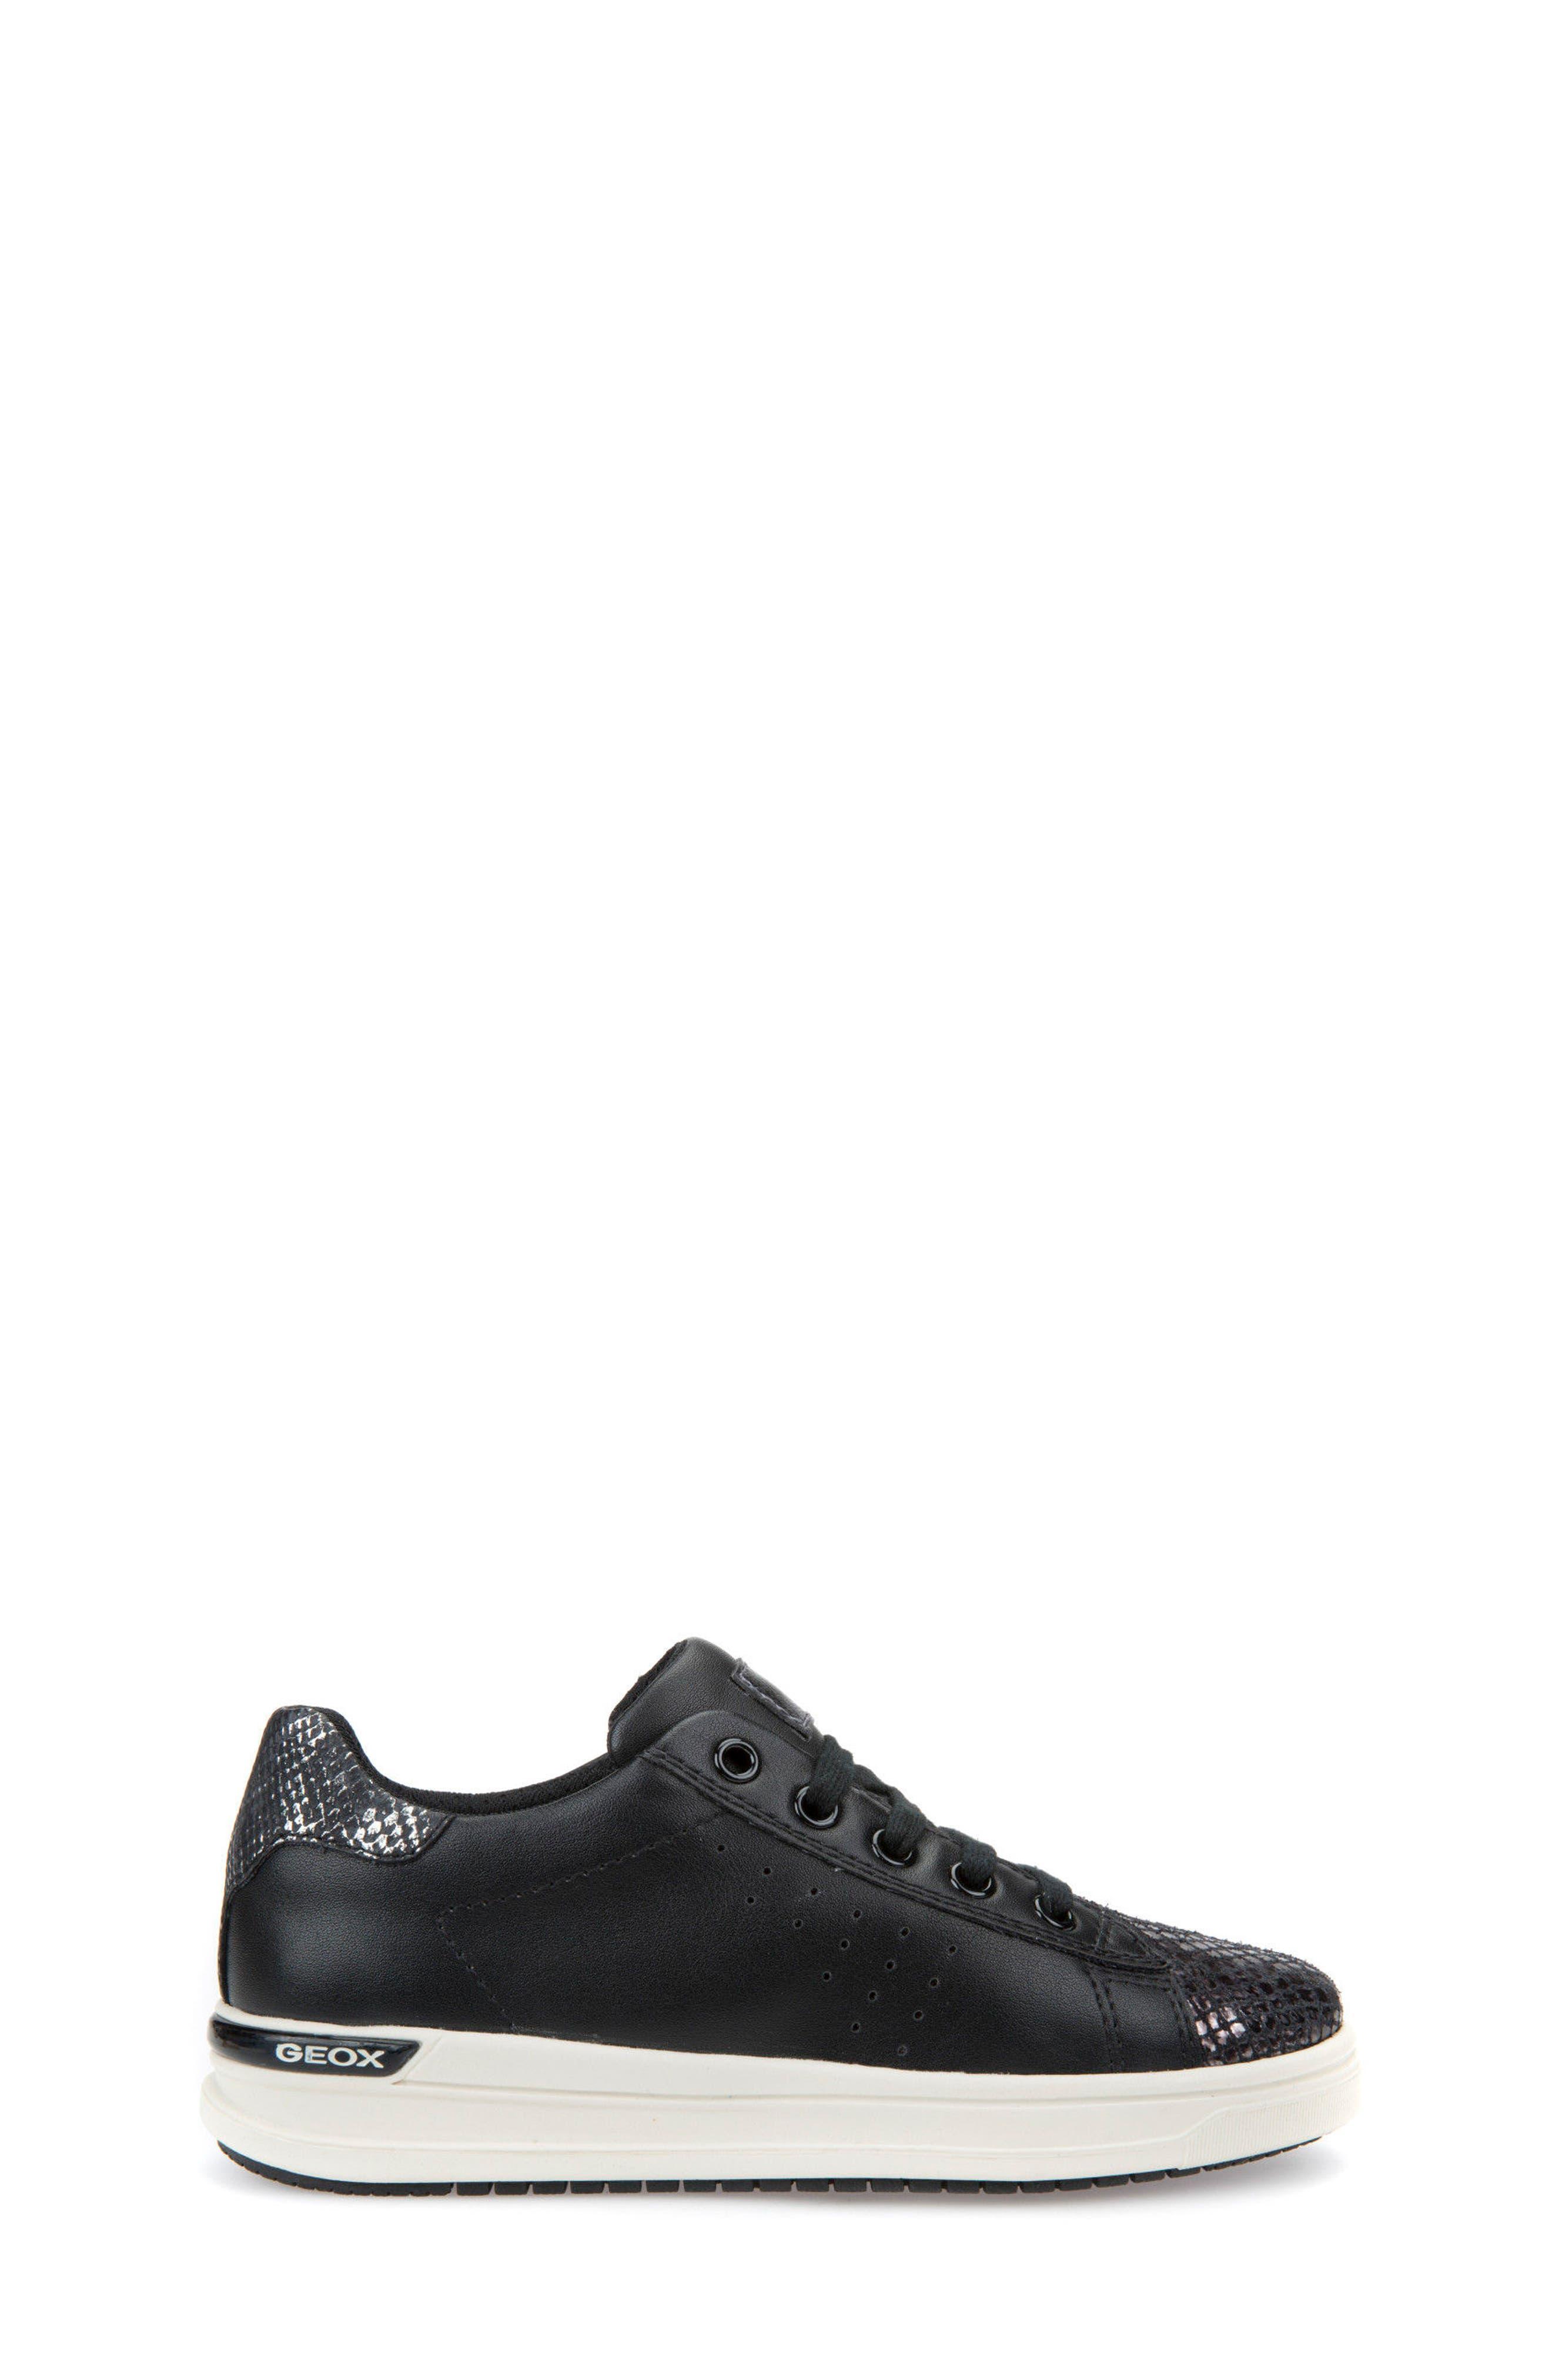 Cave Up Girl Low Top Sneaker,                             Alternate thumbnail 3, color,                             Black